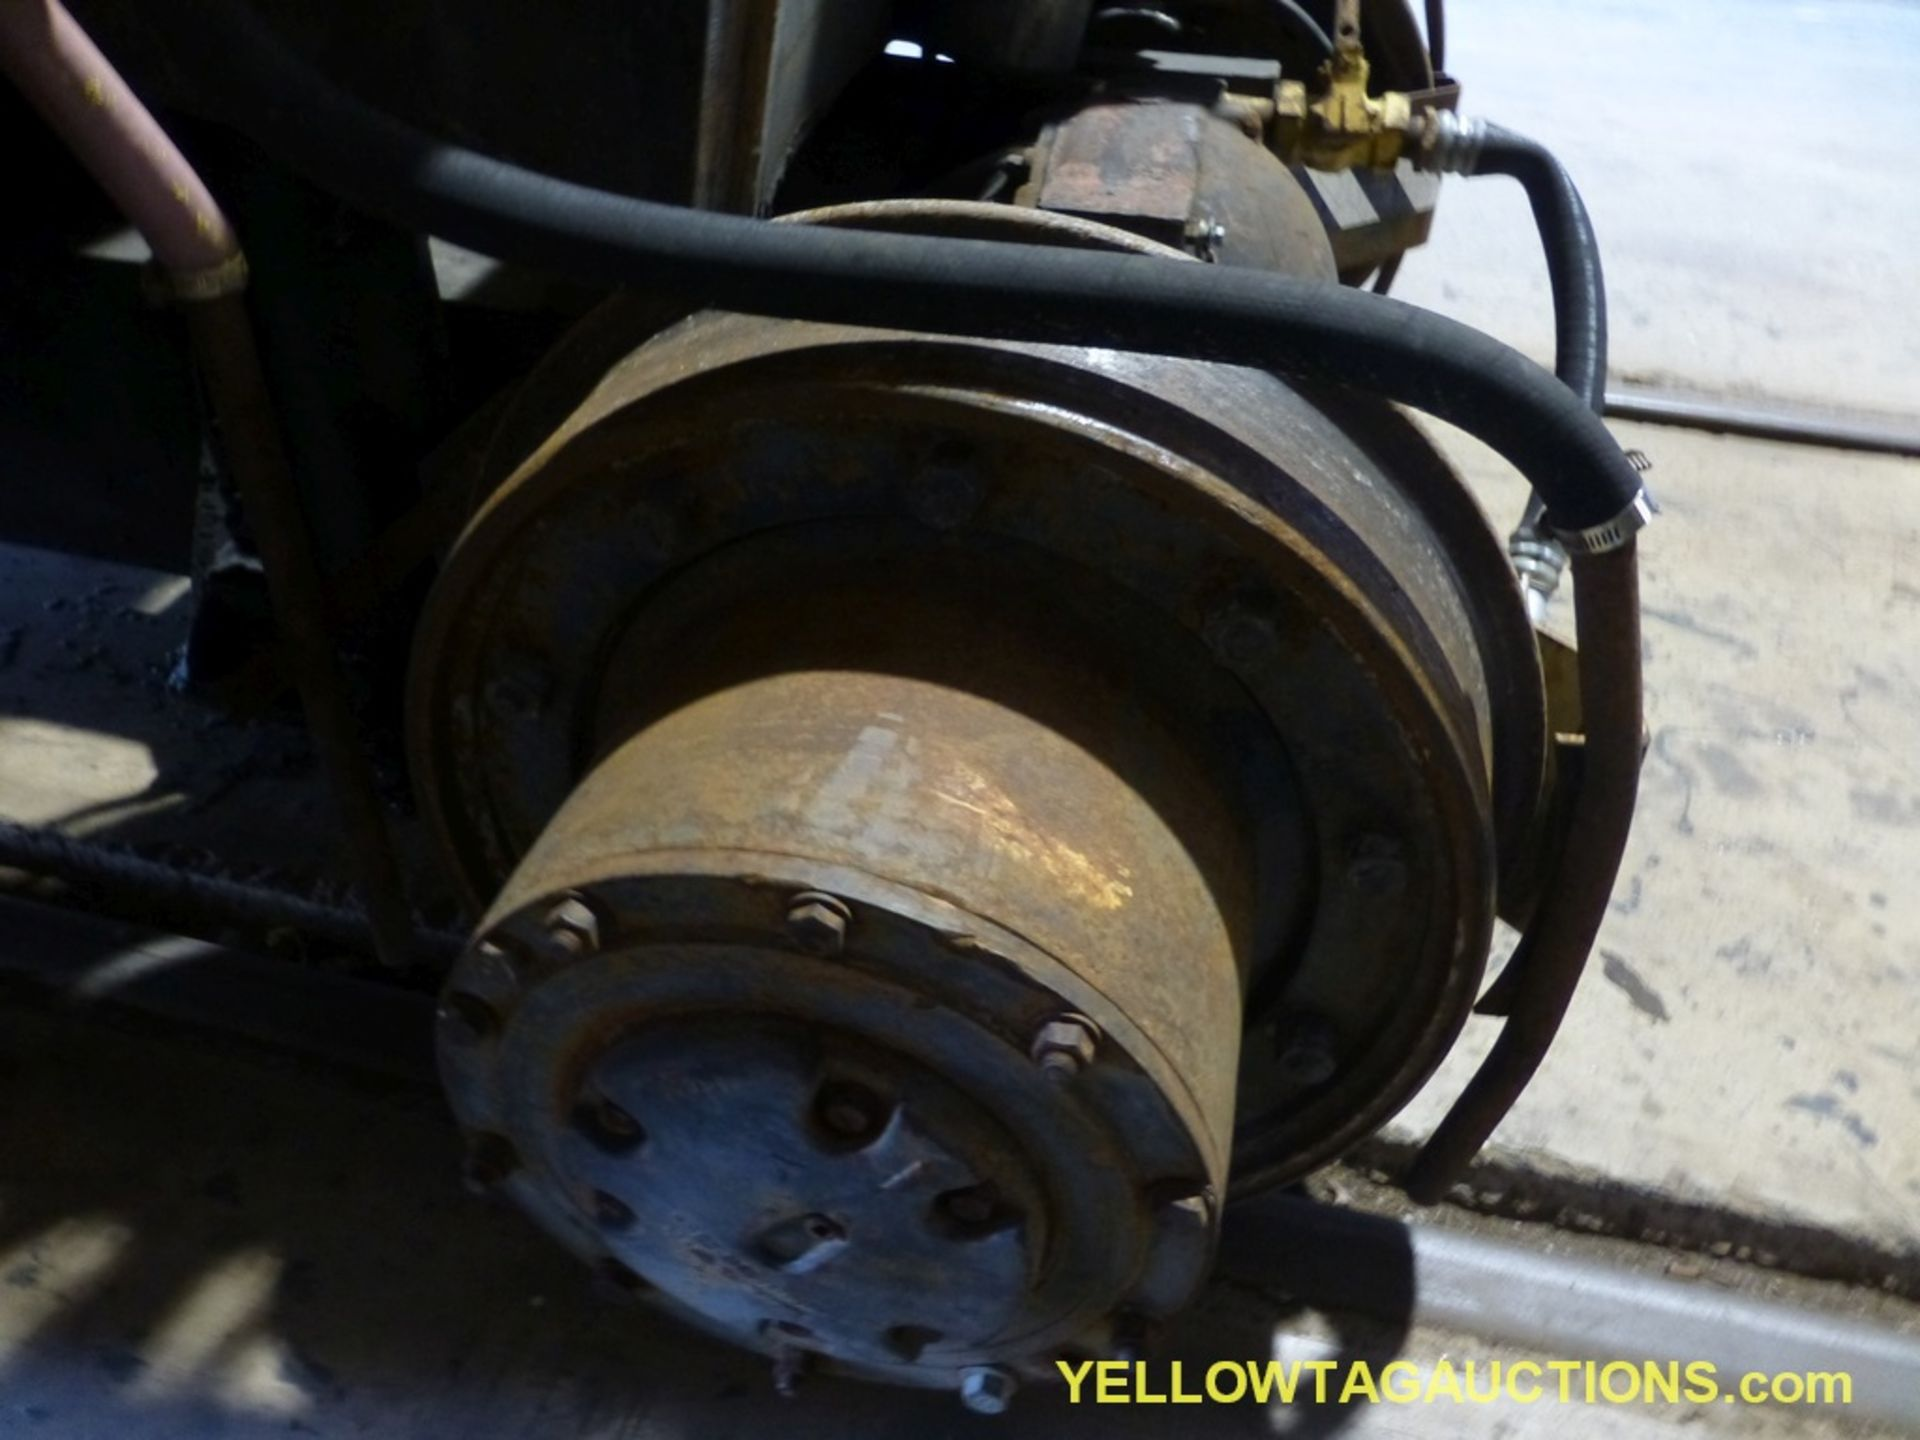 Track Mobile Rail Car Mover | Model No. 7TM; Bad Tie Rod - Image 40 of 42